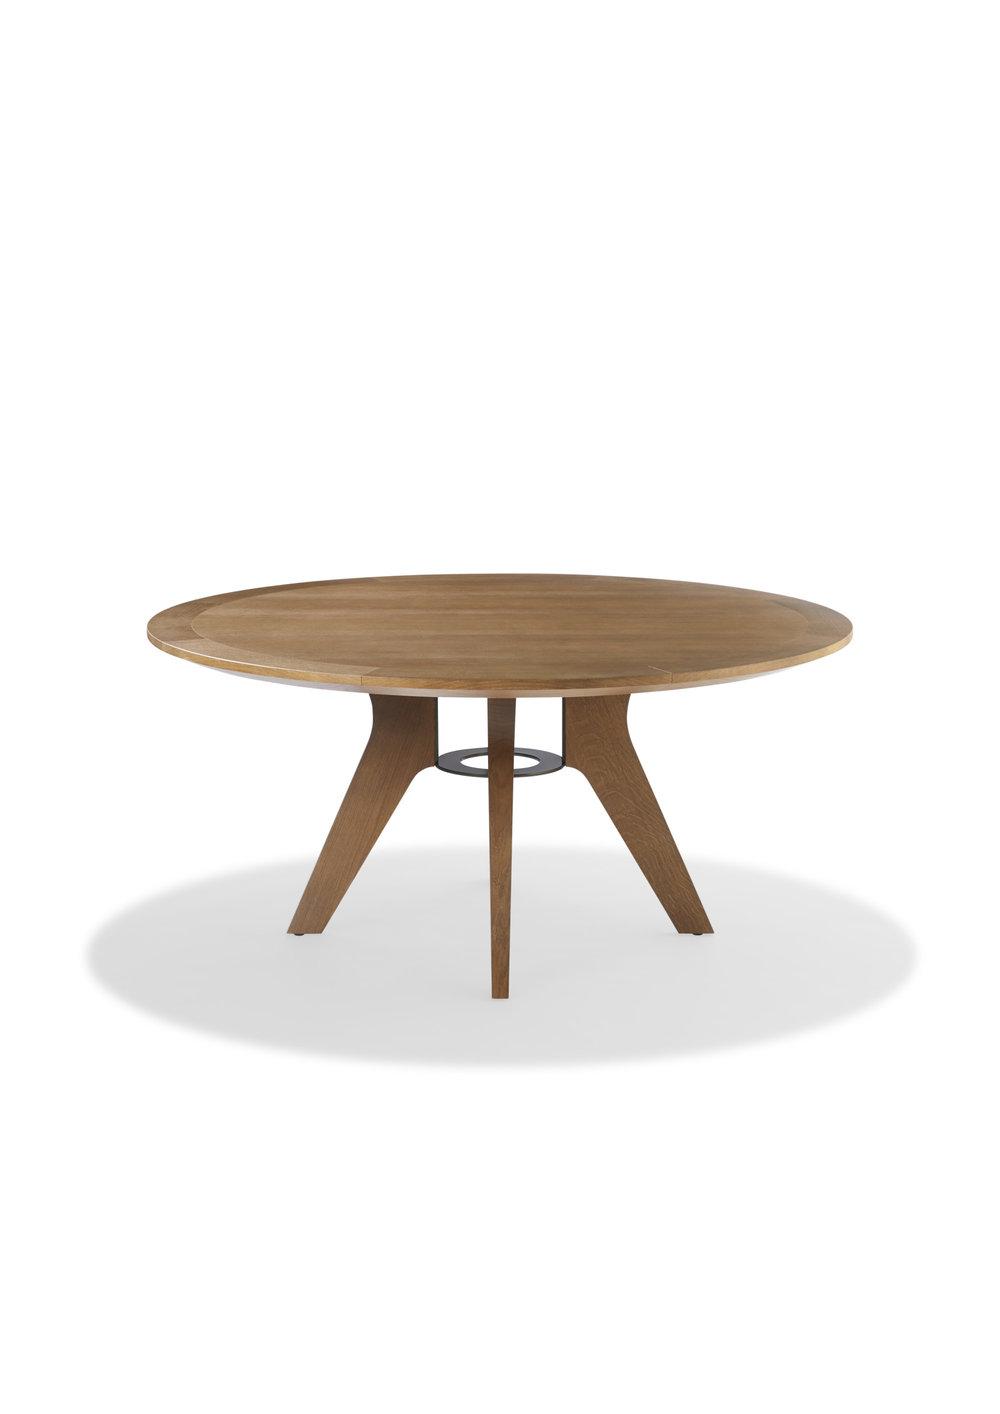 Alambria-table-2019.jpg